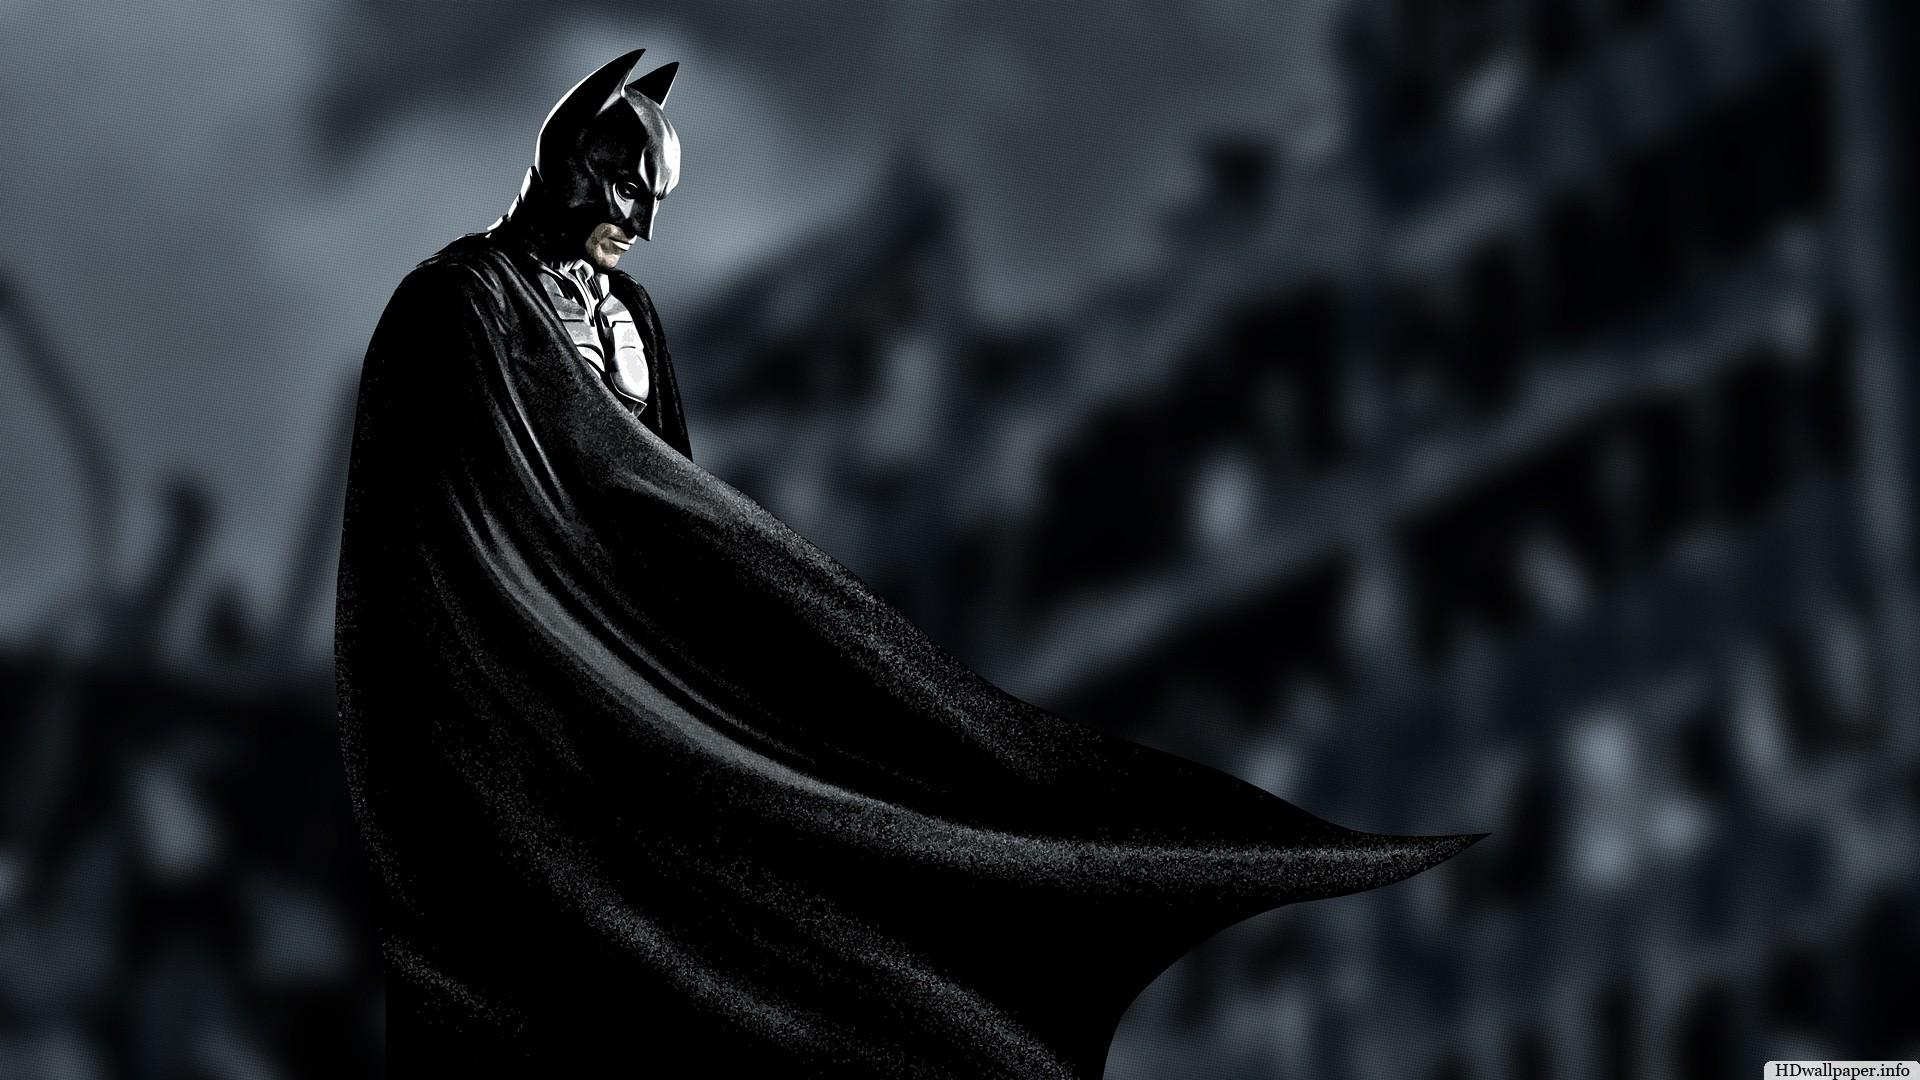 Batman Dark Knight Rises Hd Wallpaper – https://hdwallpaper.info/batman